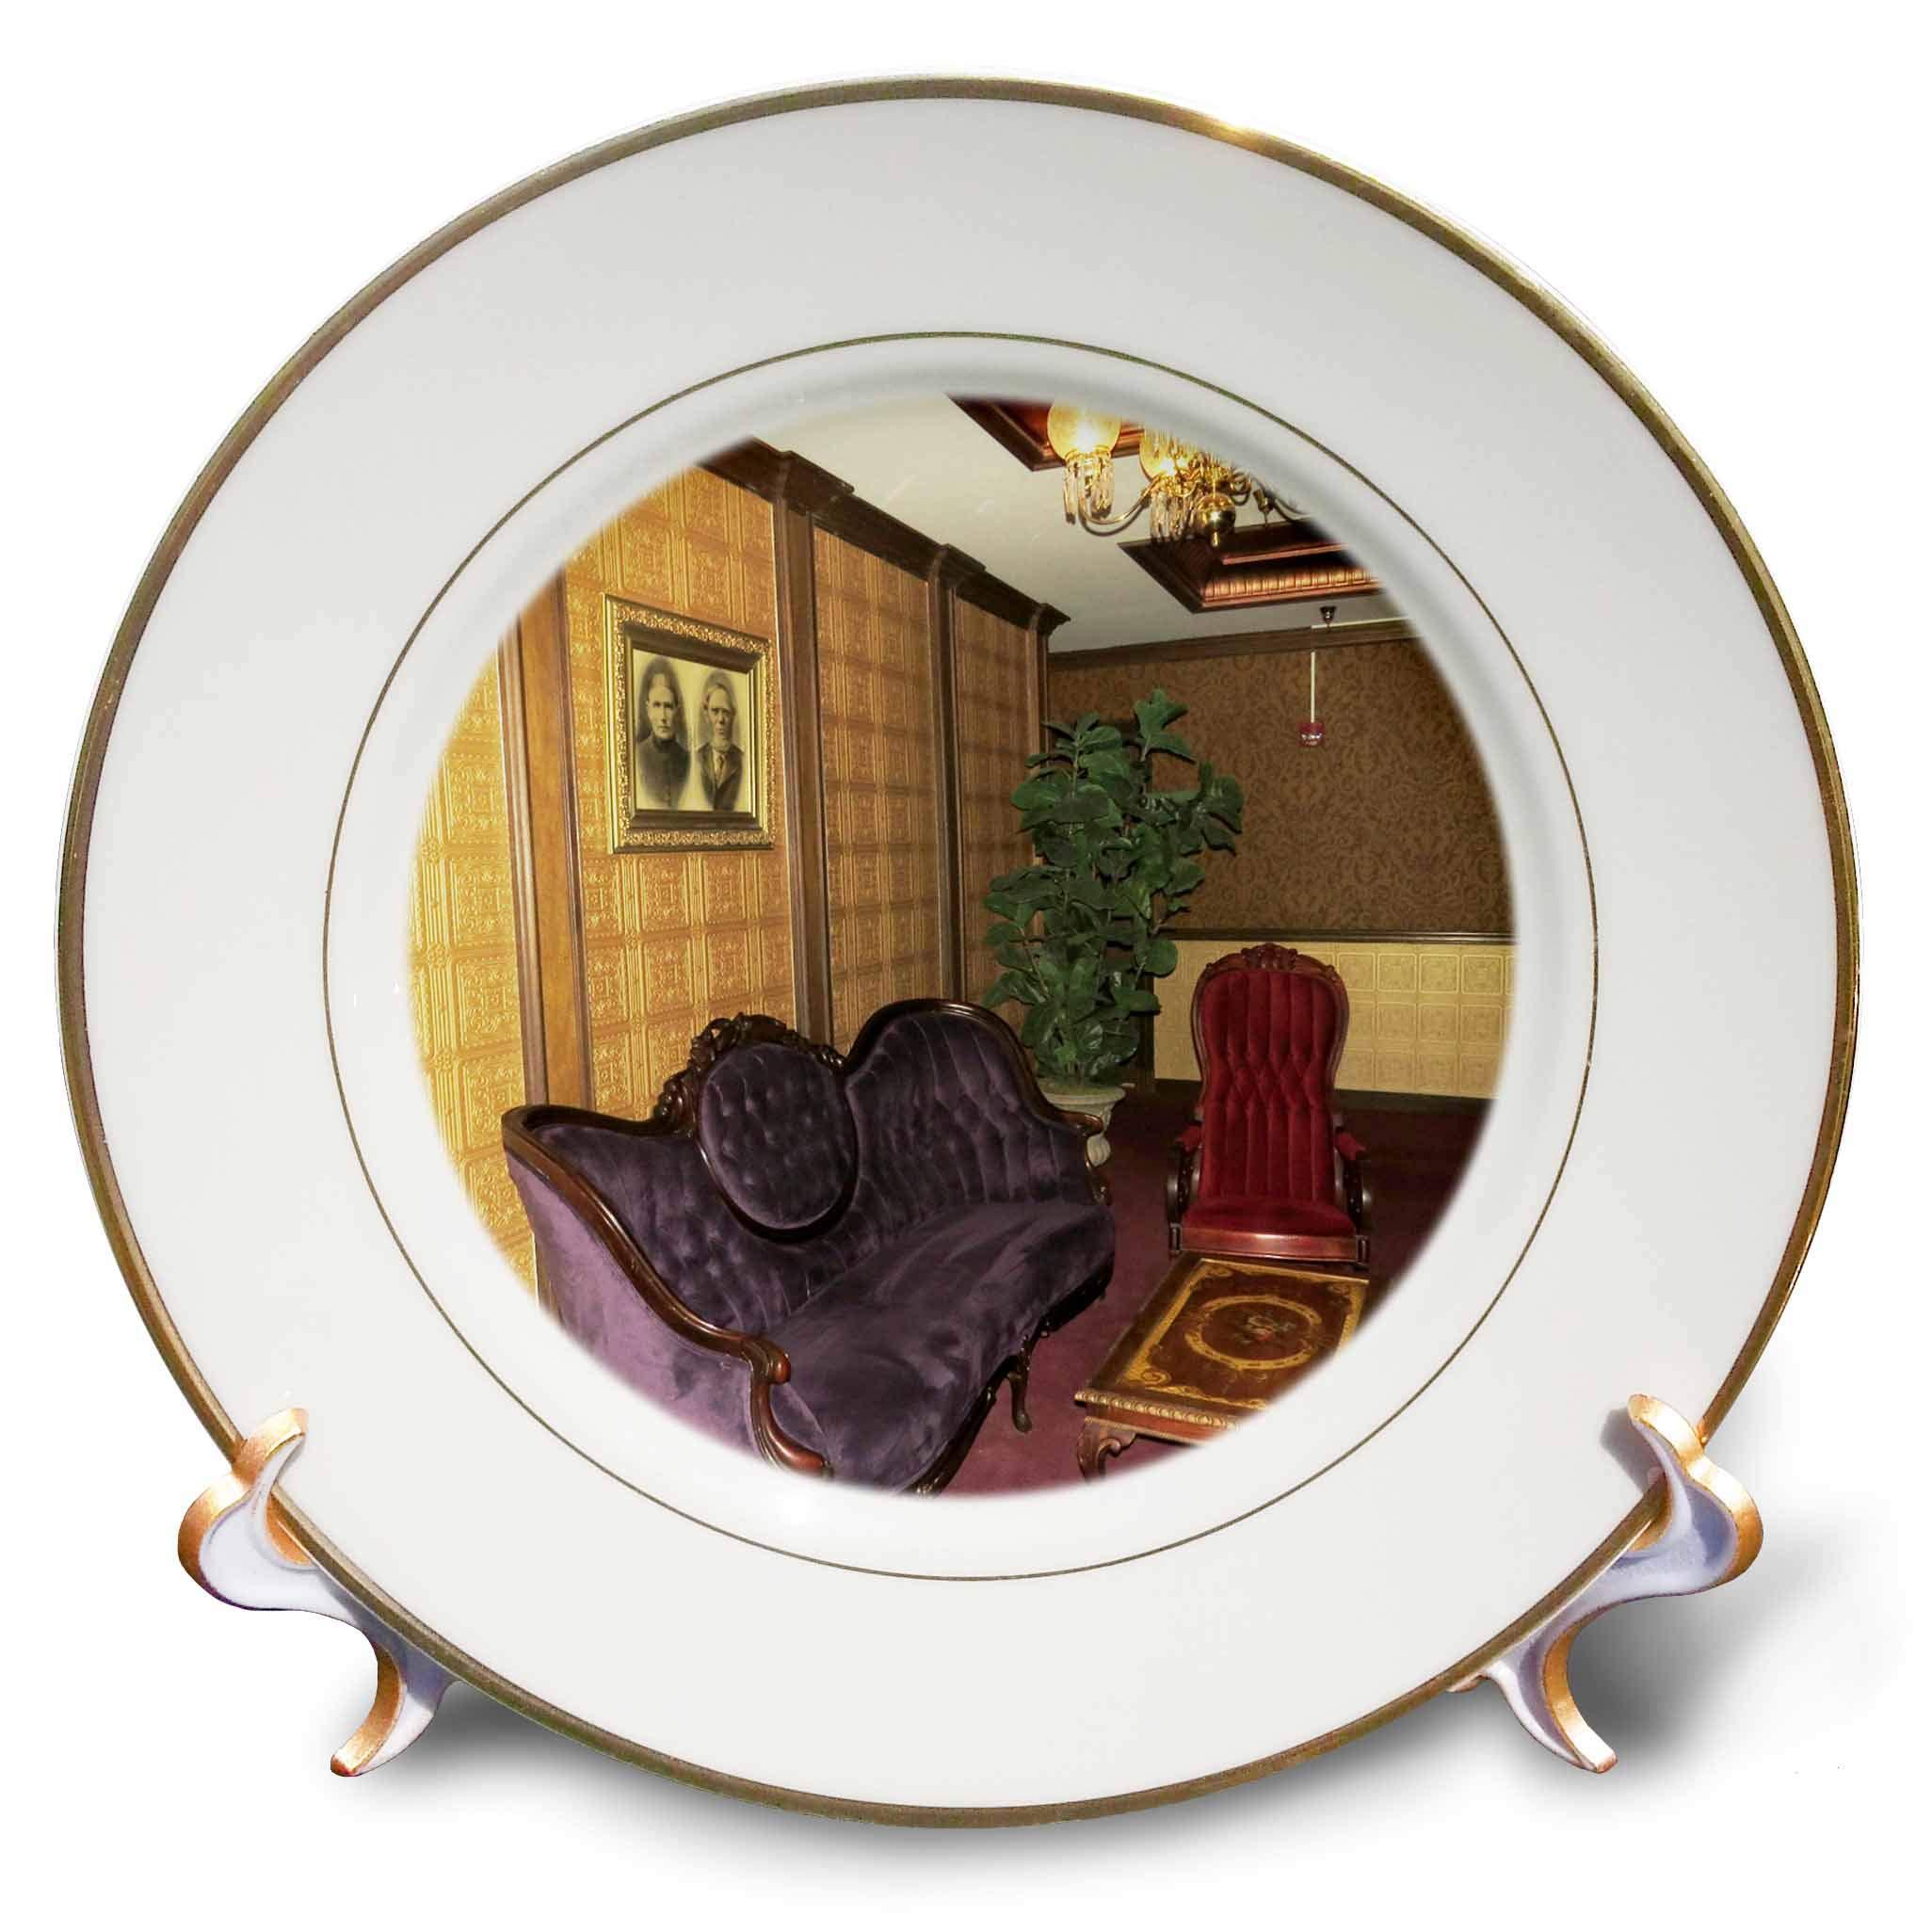 3dRose Jos Fauxtographee- Mizpah Hotel Lounge - One of The Many lounges in The Mizpah Hotel in Nevada - 8 inch Porcelain Plate (cp_291362_1)